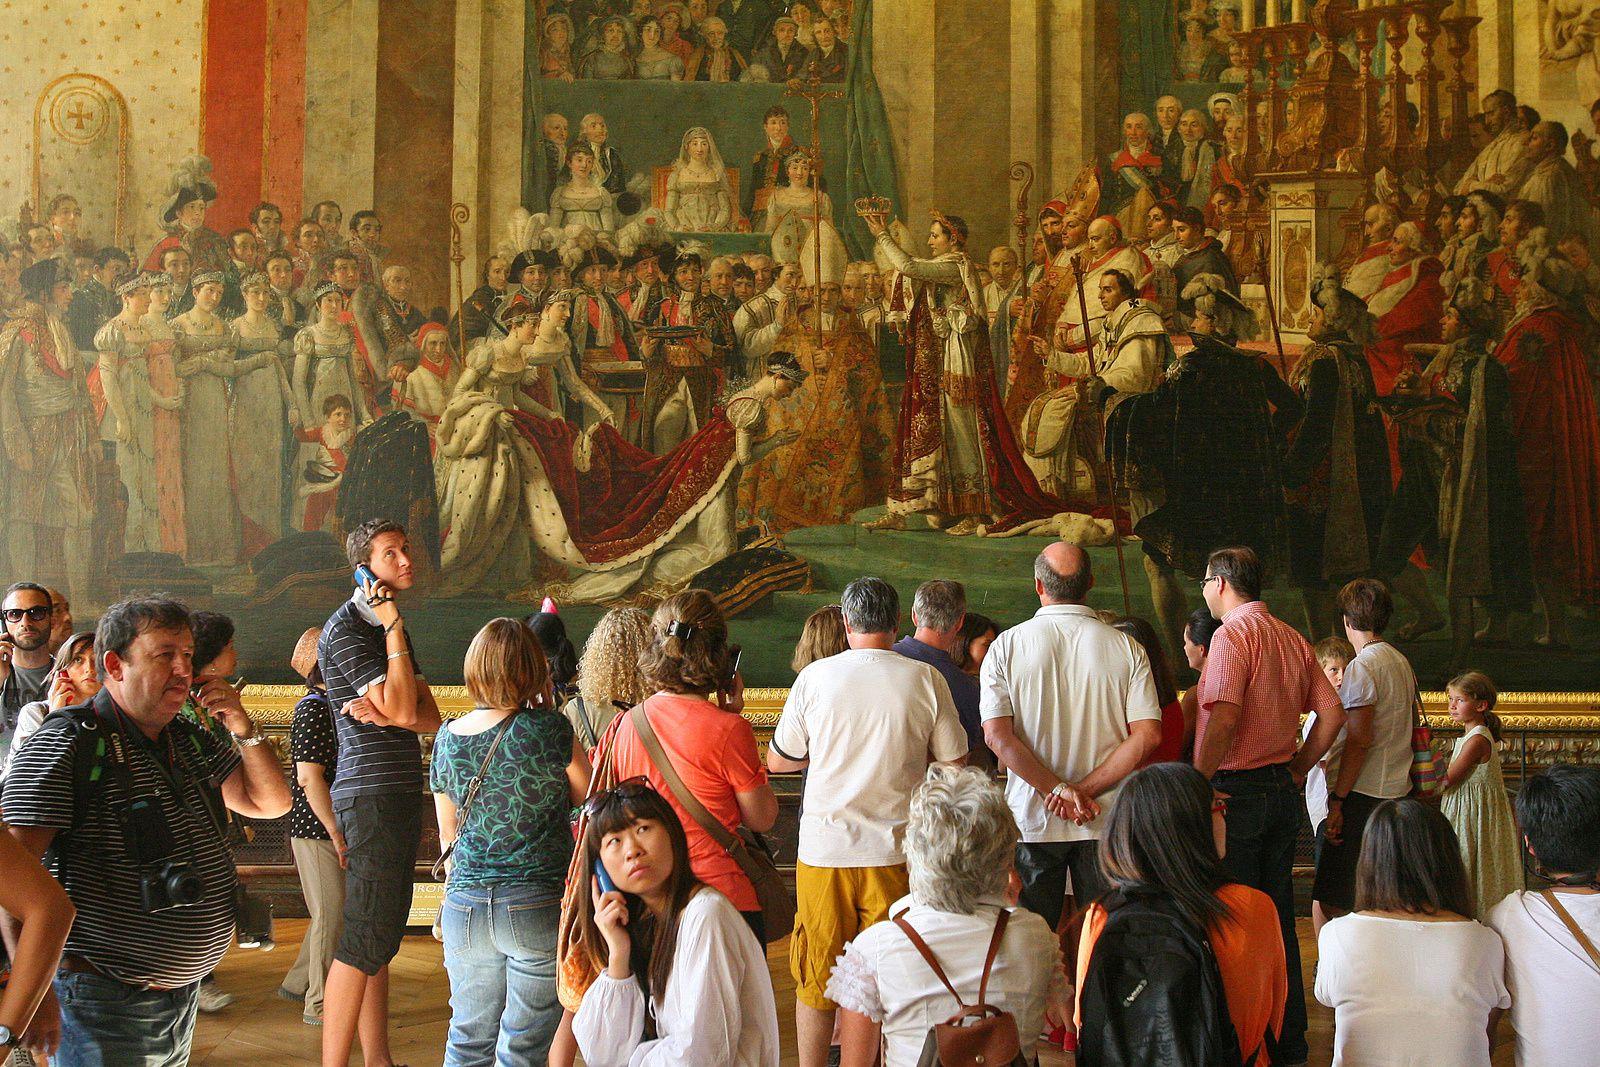 Touristes inspirés par Napoléon ... ou pas